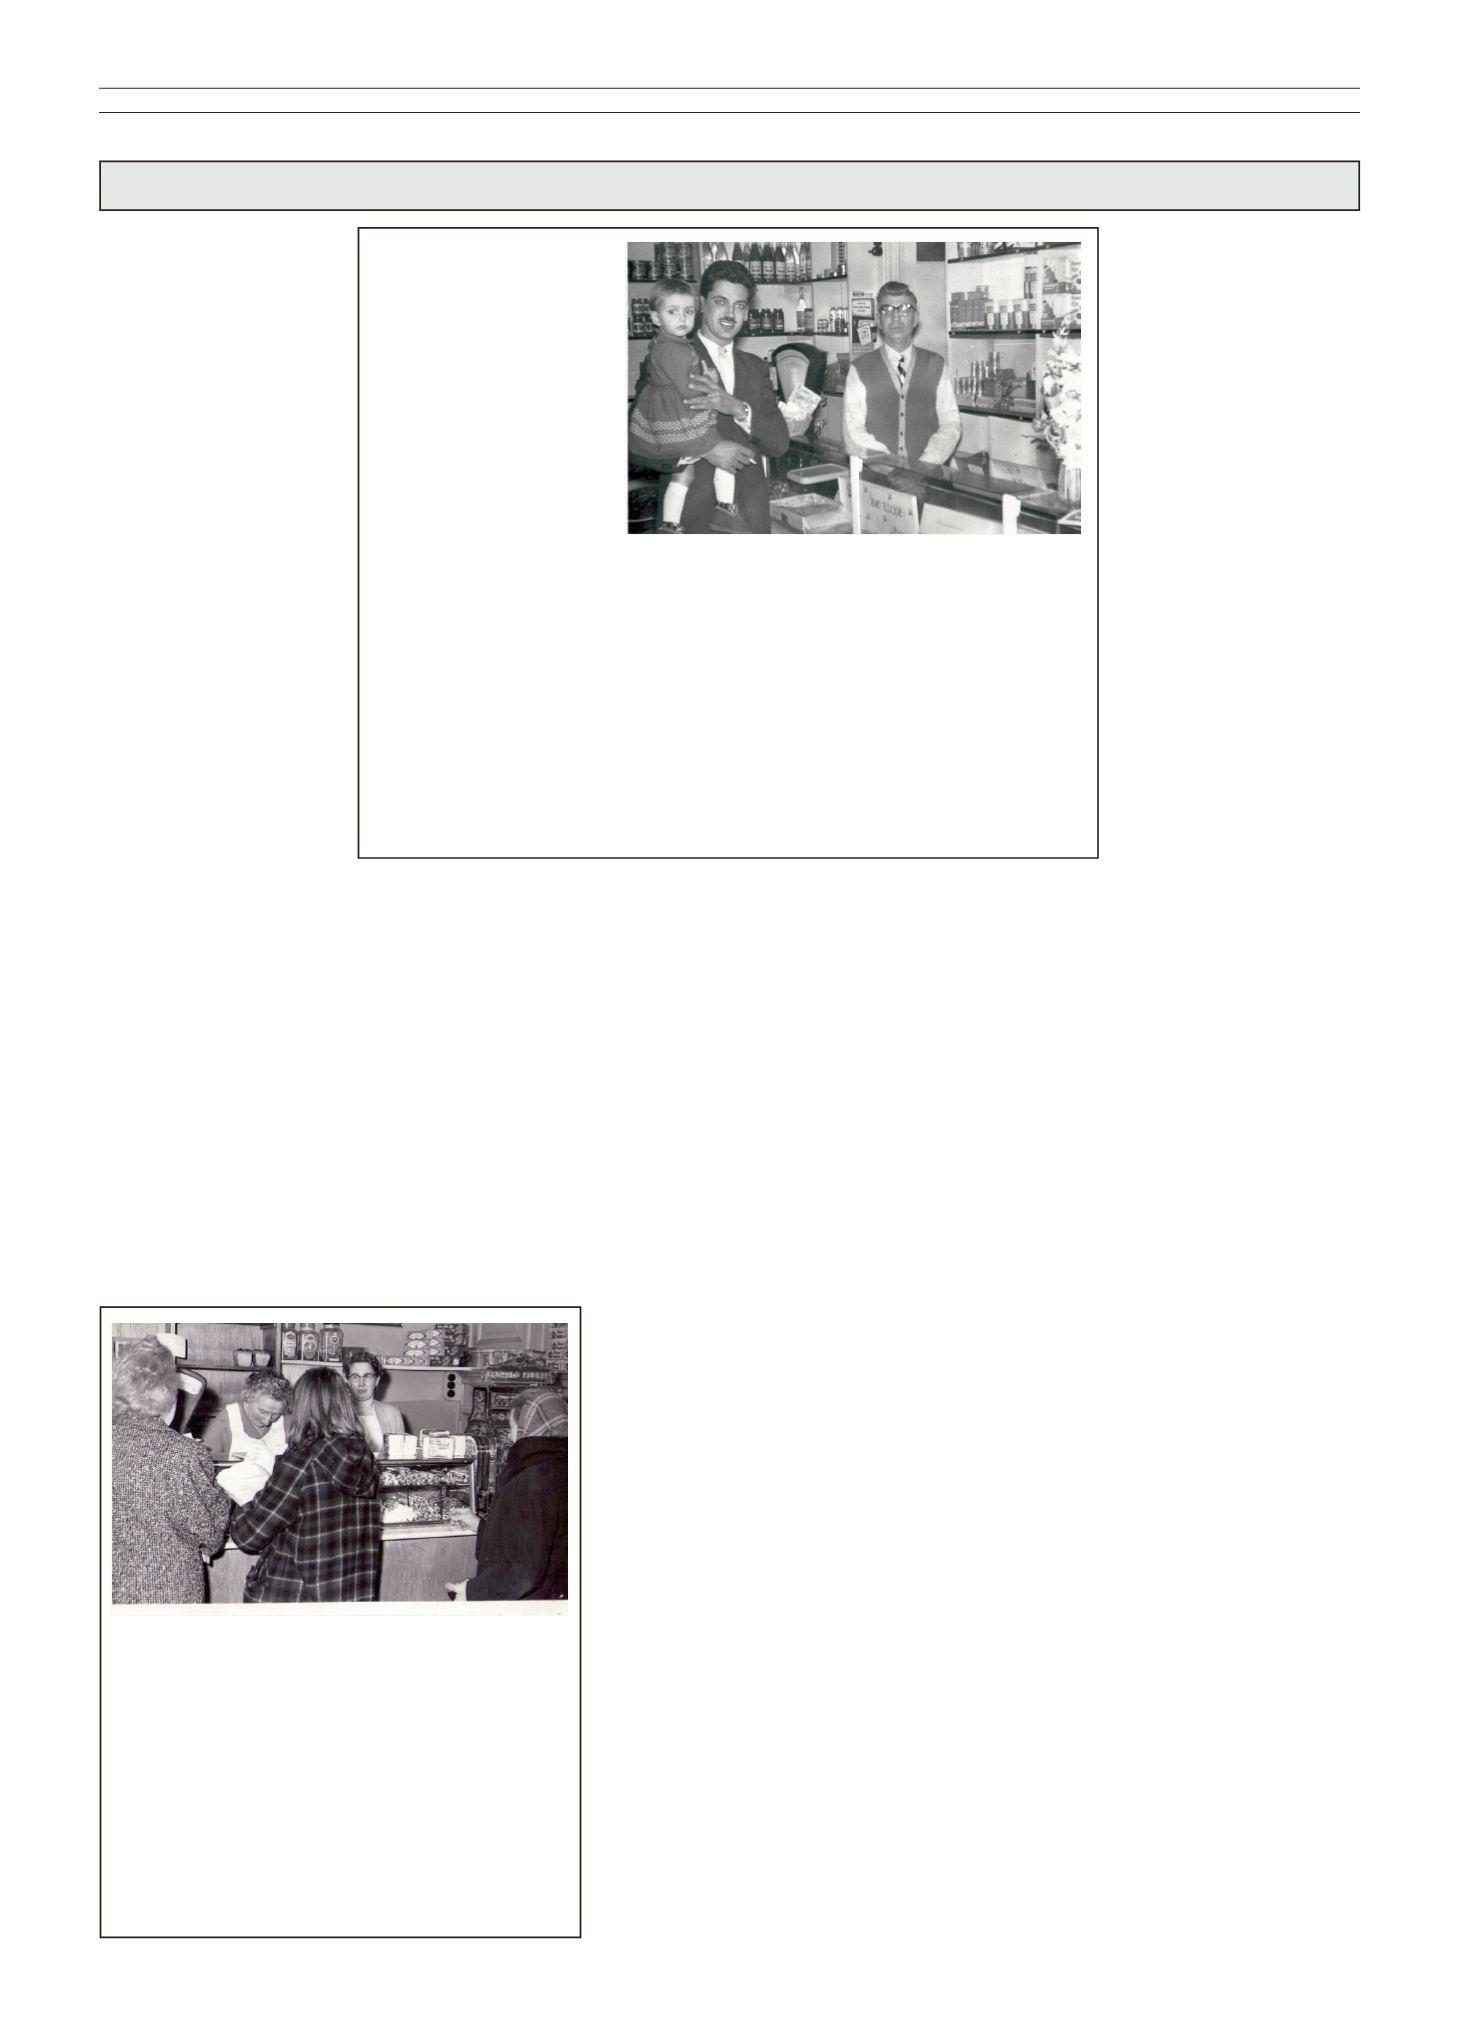 #37323423610228 De Oud Rotterdammer Week 34 Page 21 betrouwbaar Design Meubelwinkels Rotterdam 2697 afbeelding opslaan 147820262697 Idee